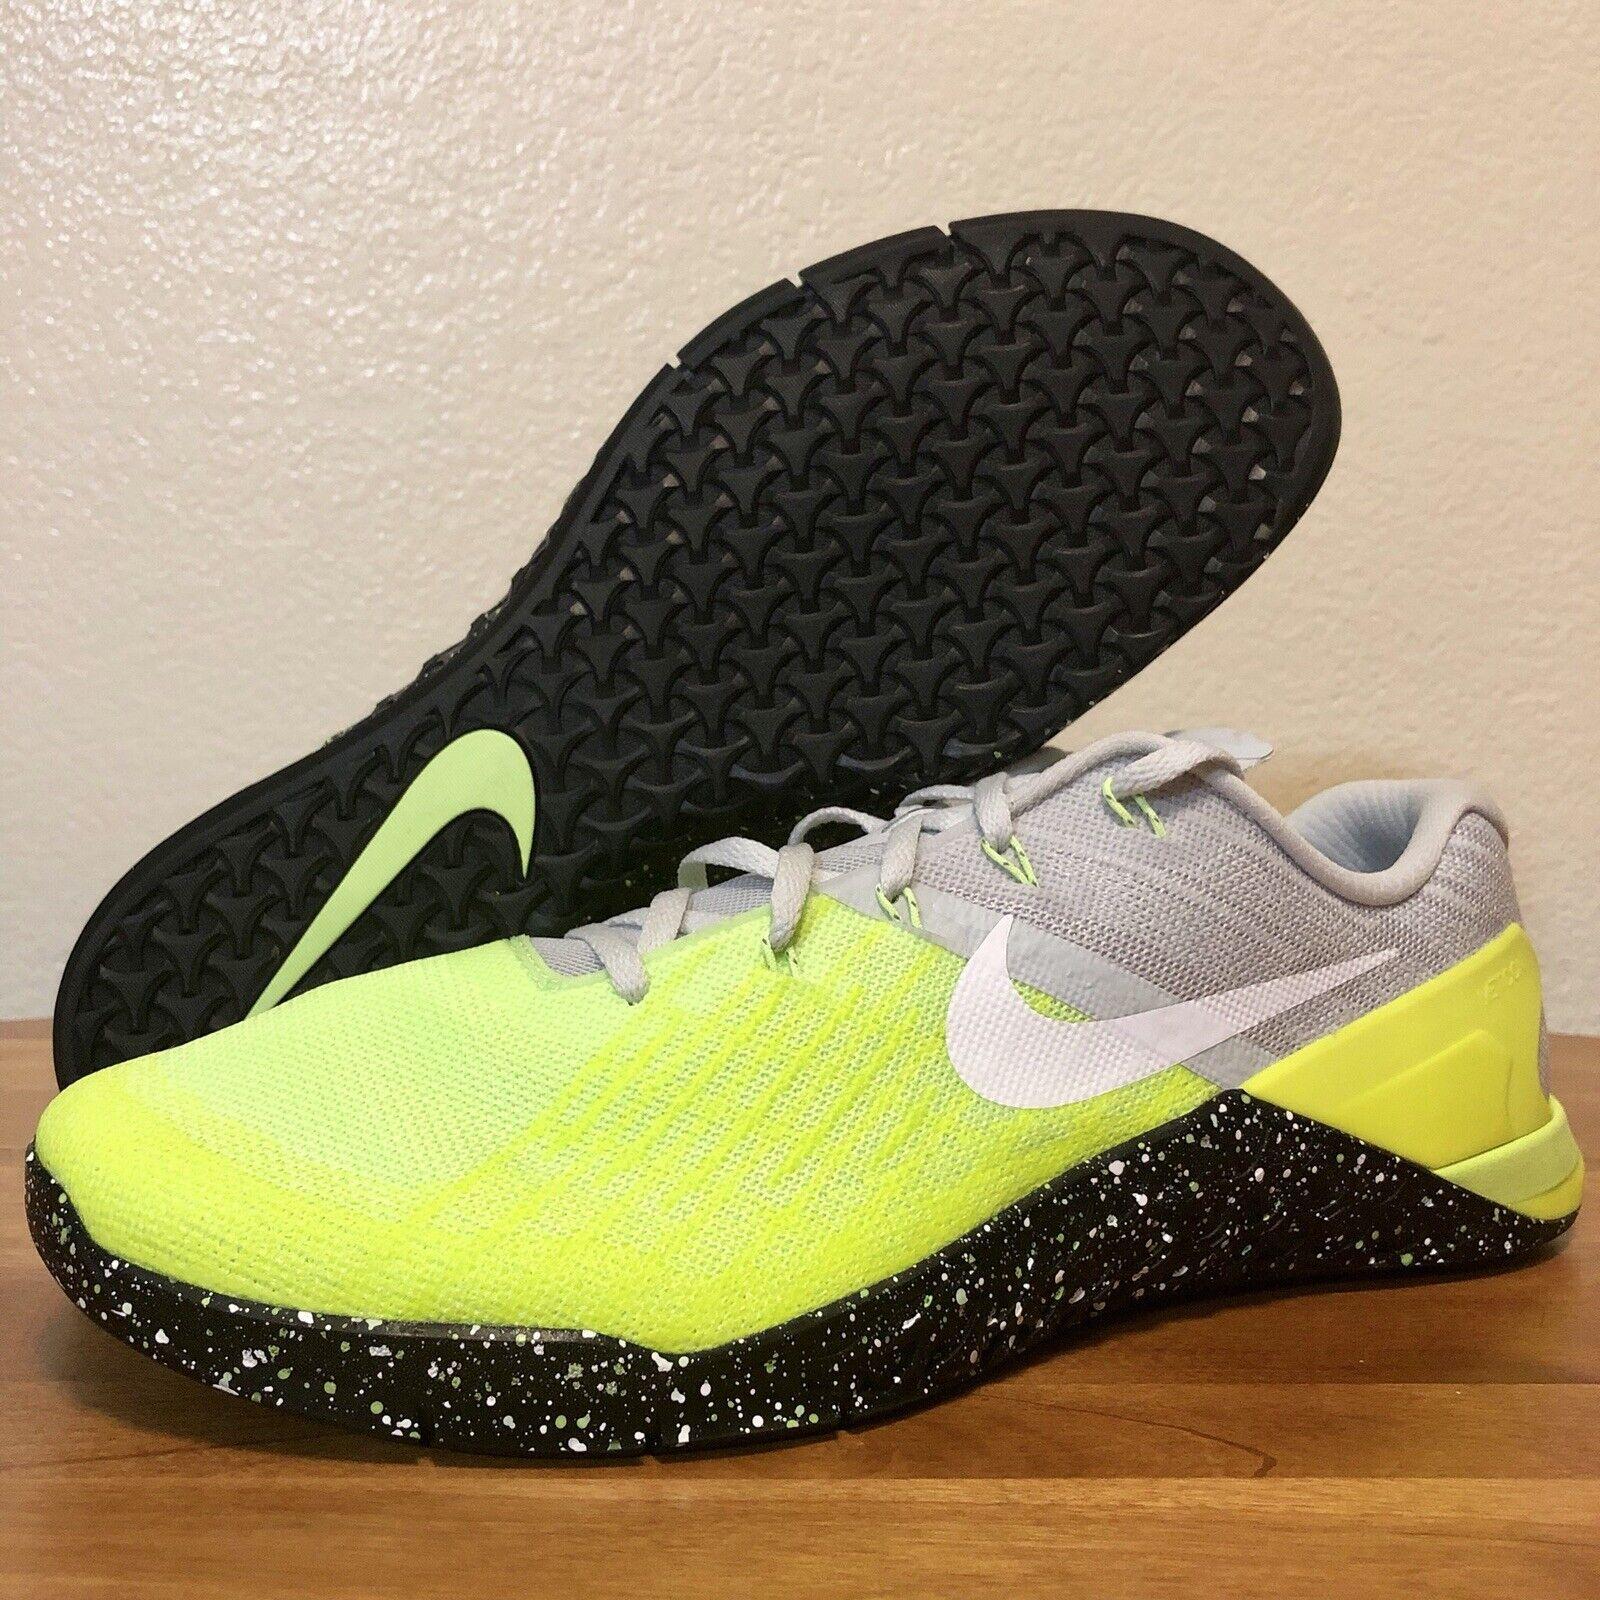 Mew Nike Metcon 3 Volt Training Crossfit shoes Men's Size 14